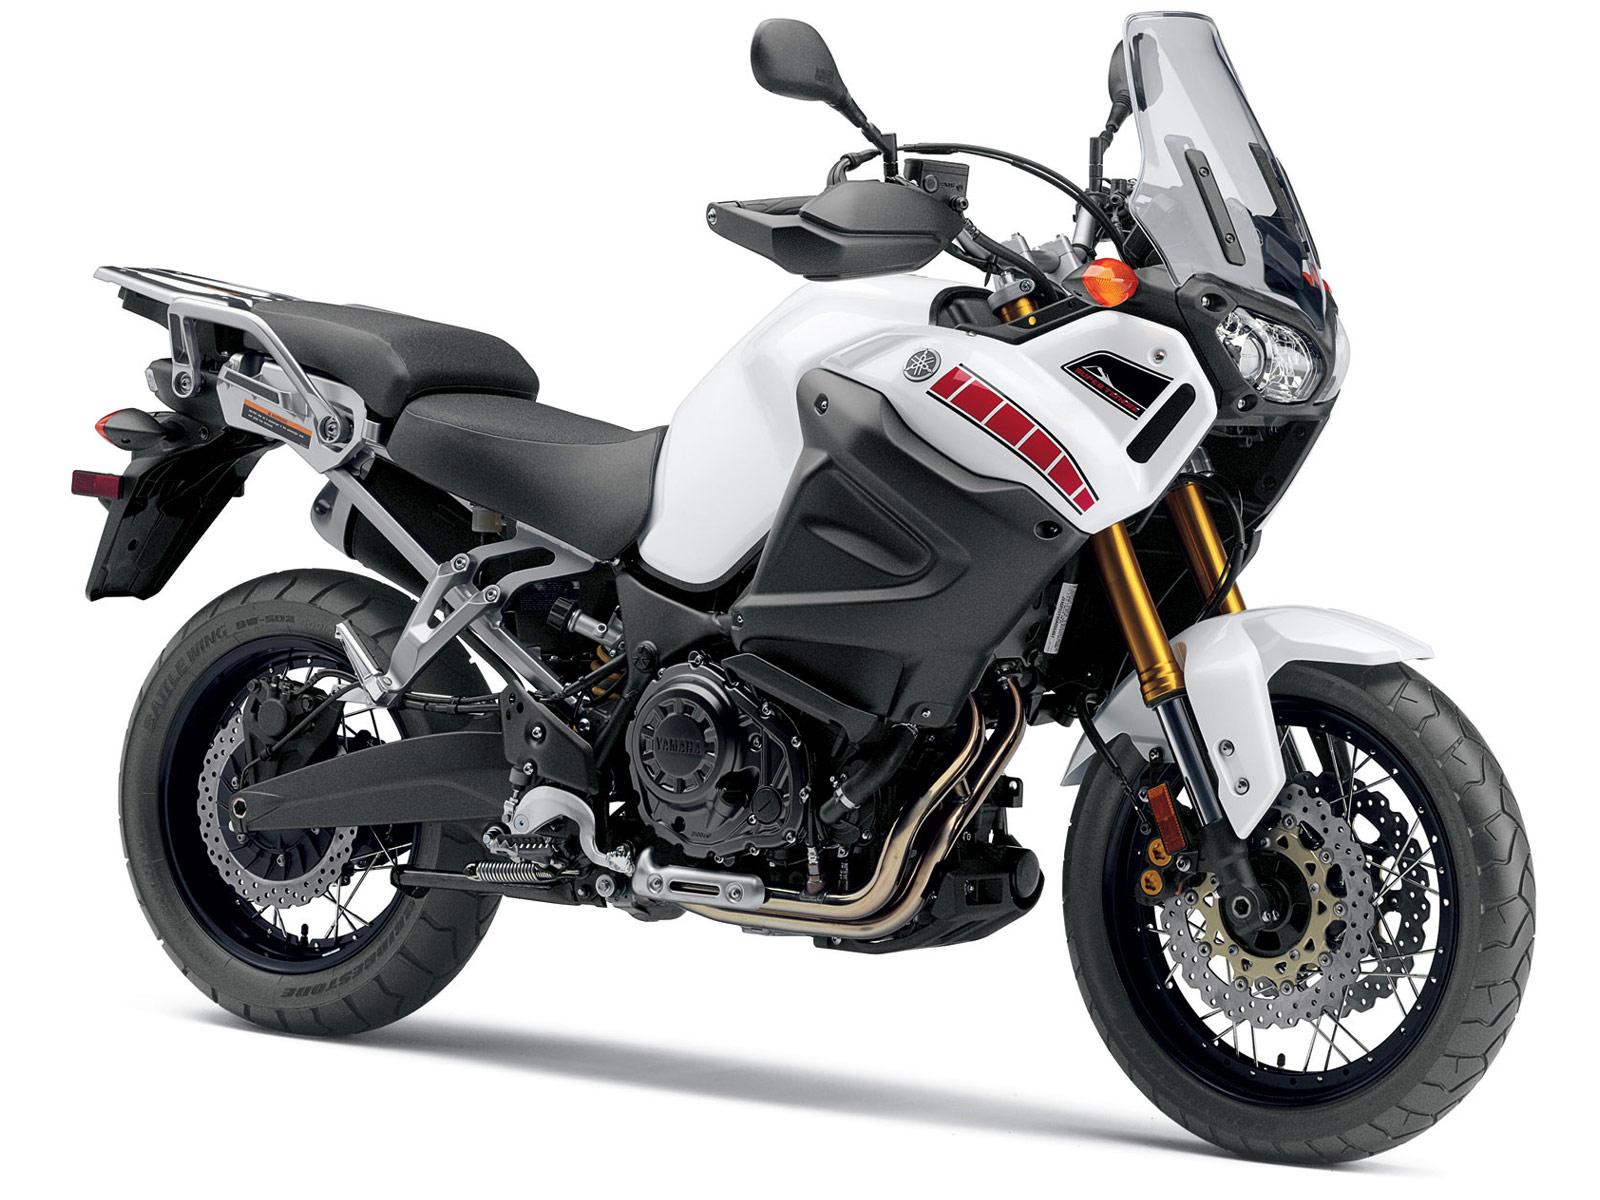 Yamaha-pictures-2013-Super-Tenere-5 2013 Yamaha Super Tenere